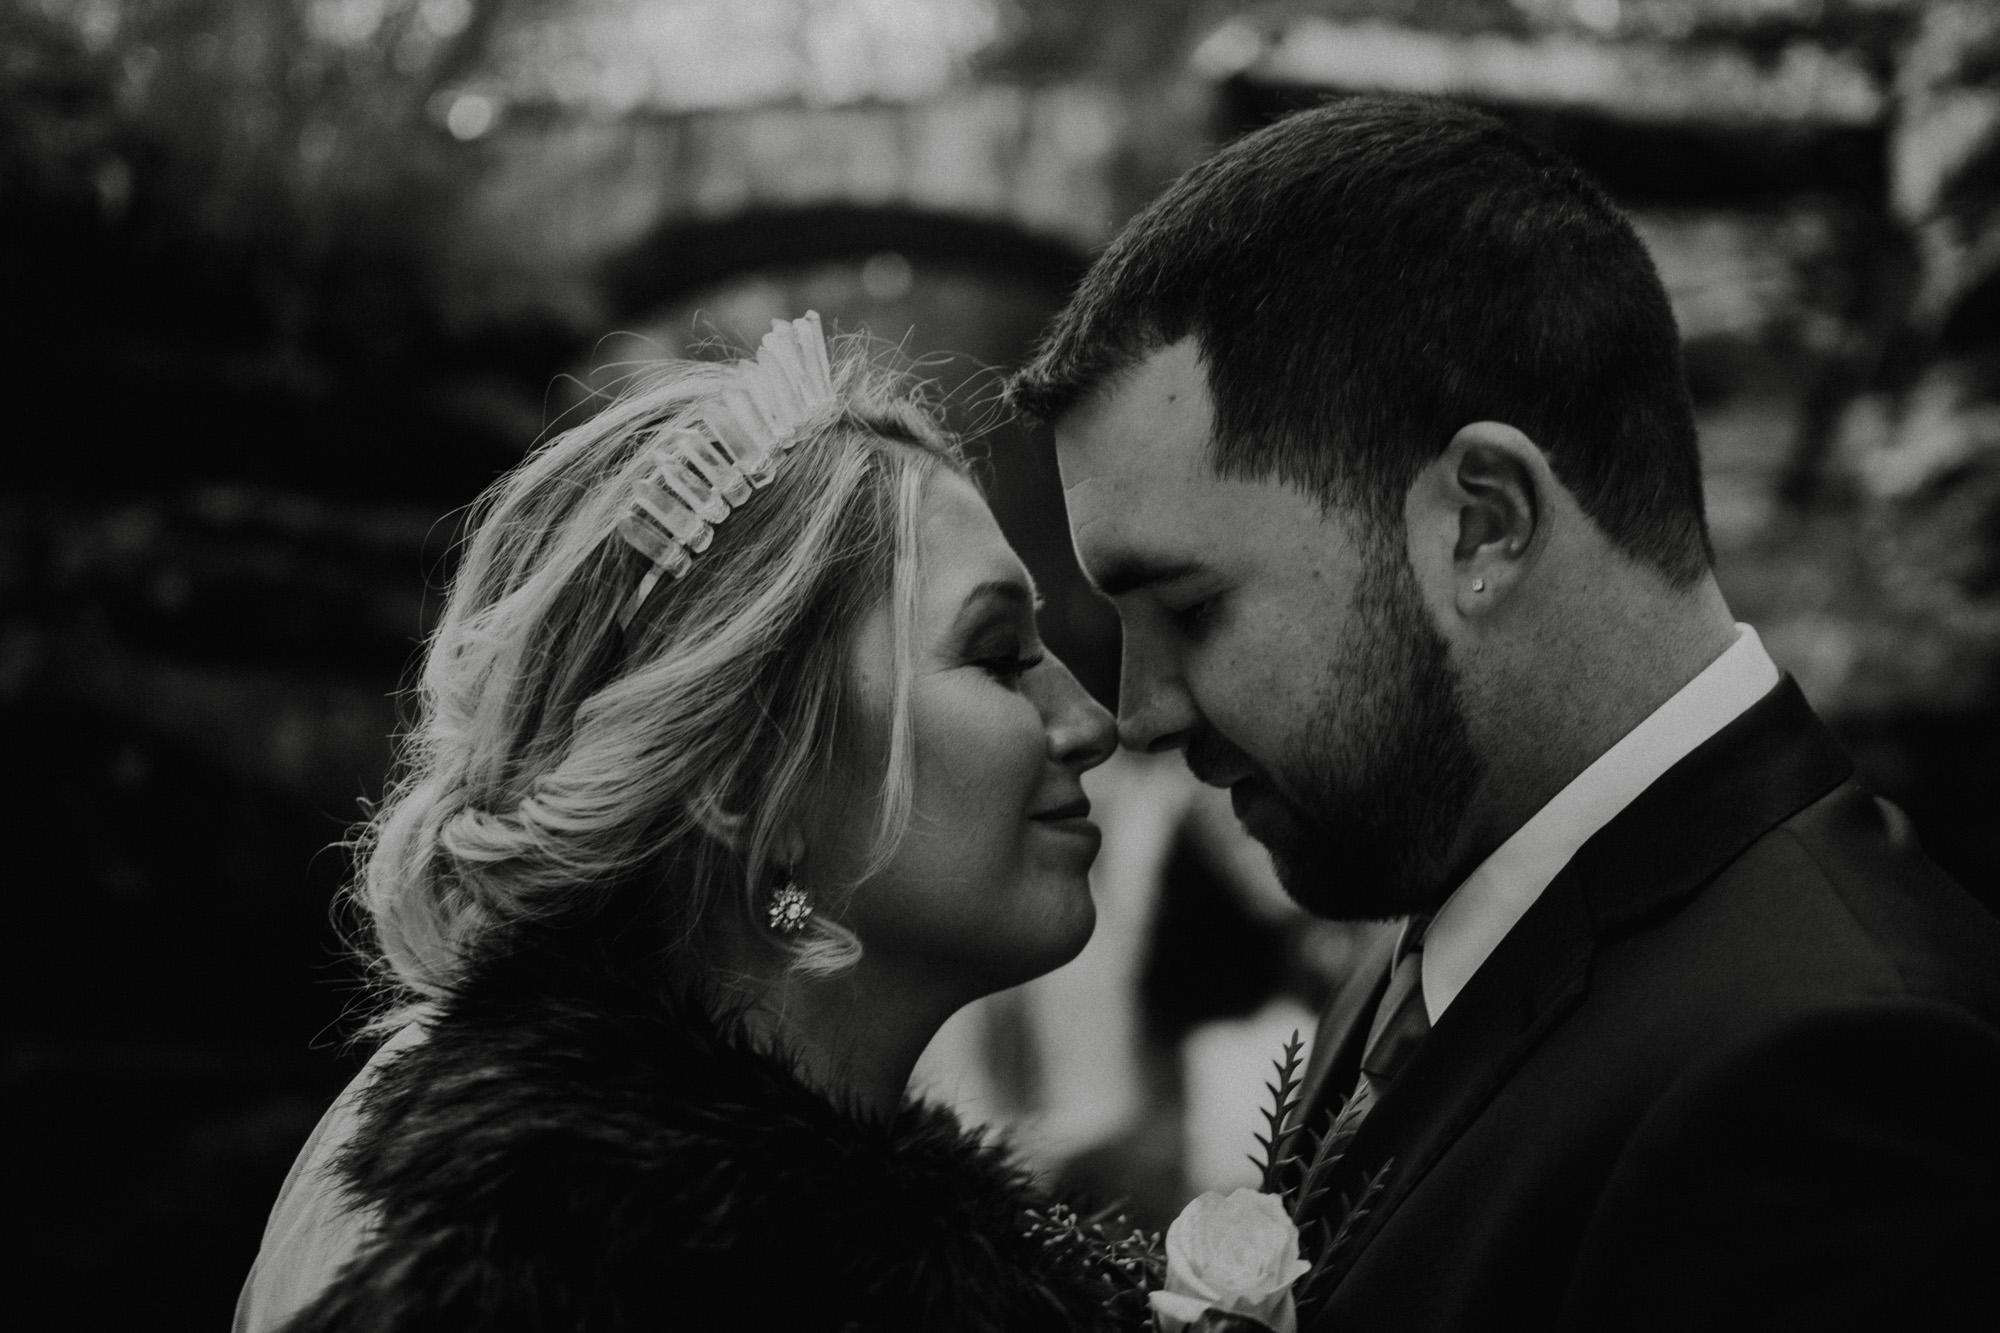 Cate_Ann_Photography_Dayton_Ohio_Wedding_Elopement_And_Engagement_PhotographerDSC_6143.jpg